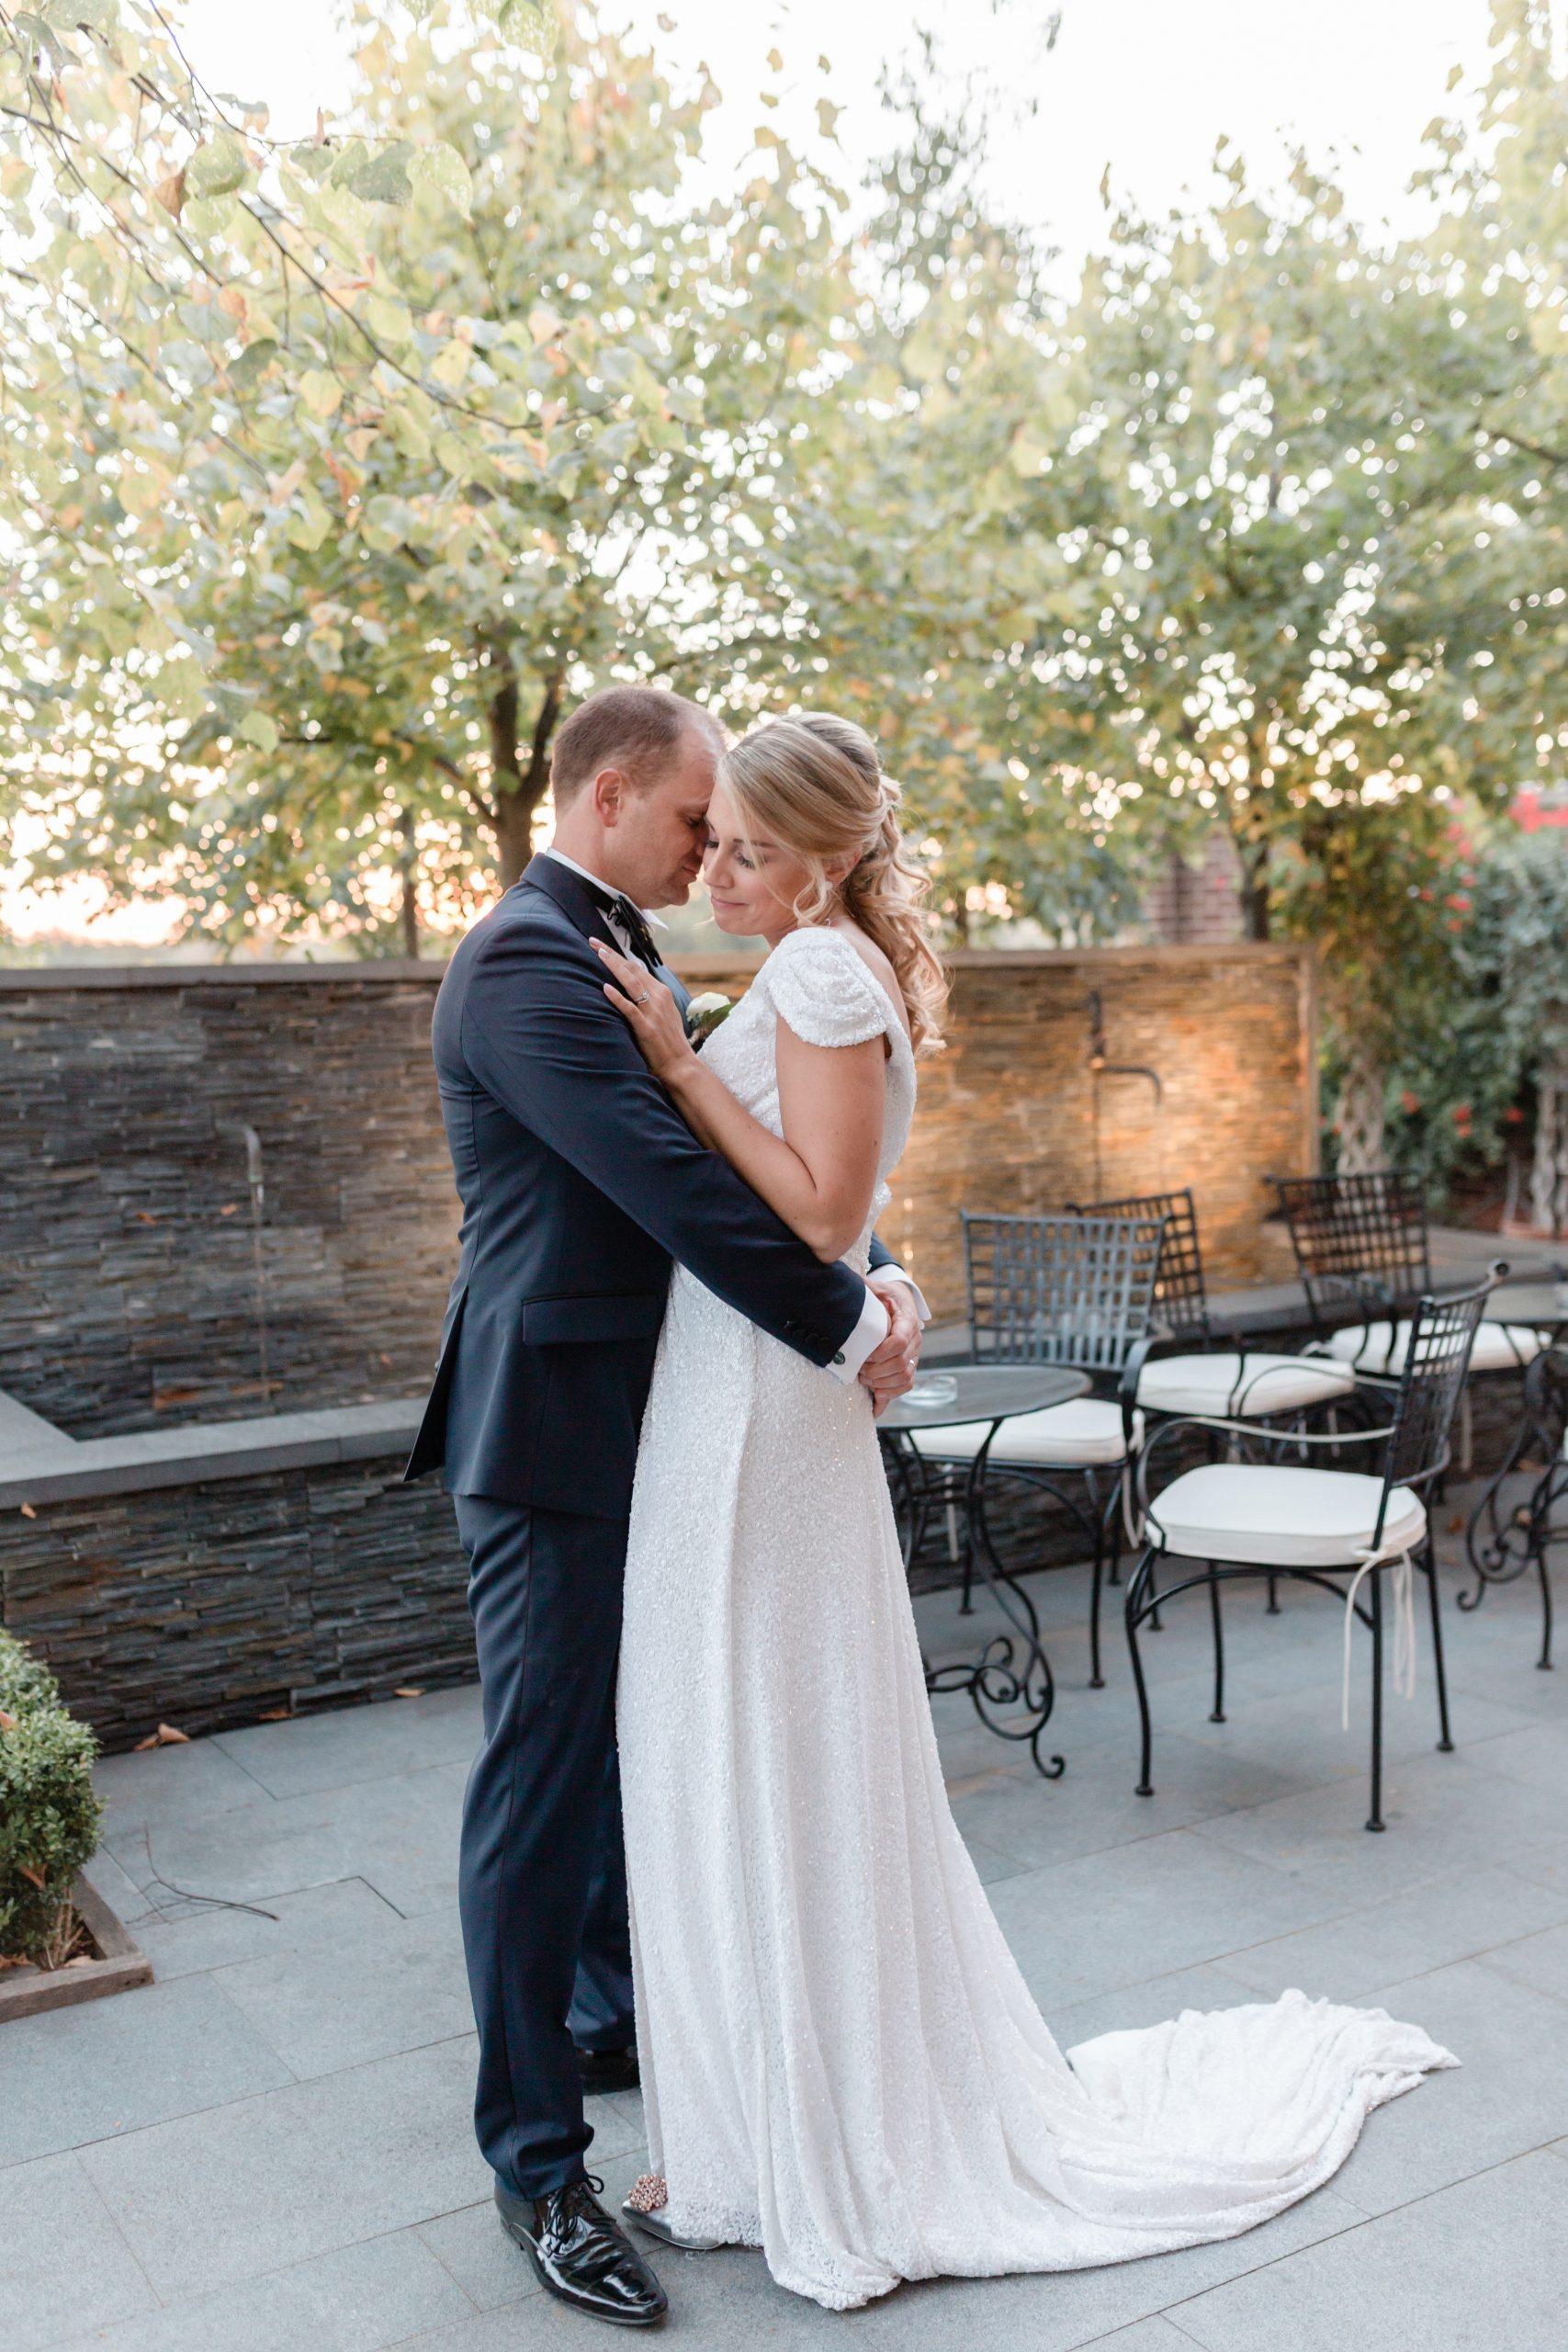 Wedding | Amy & David | The Lion Inn